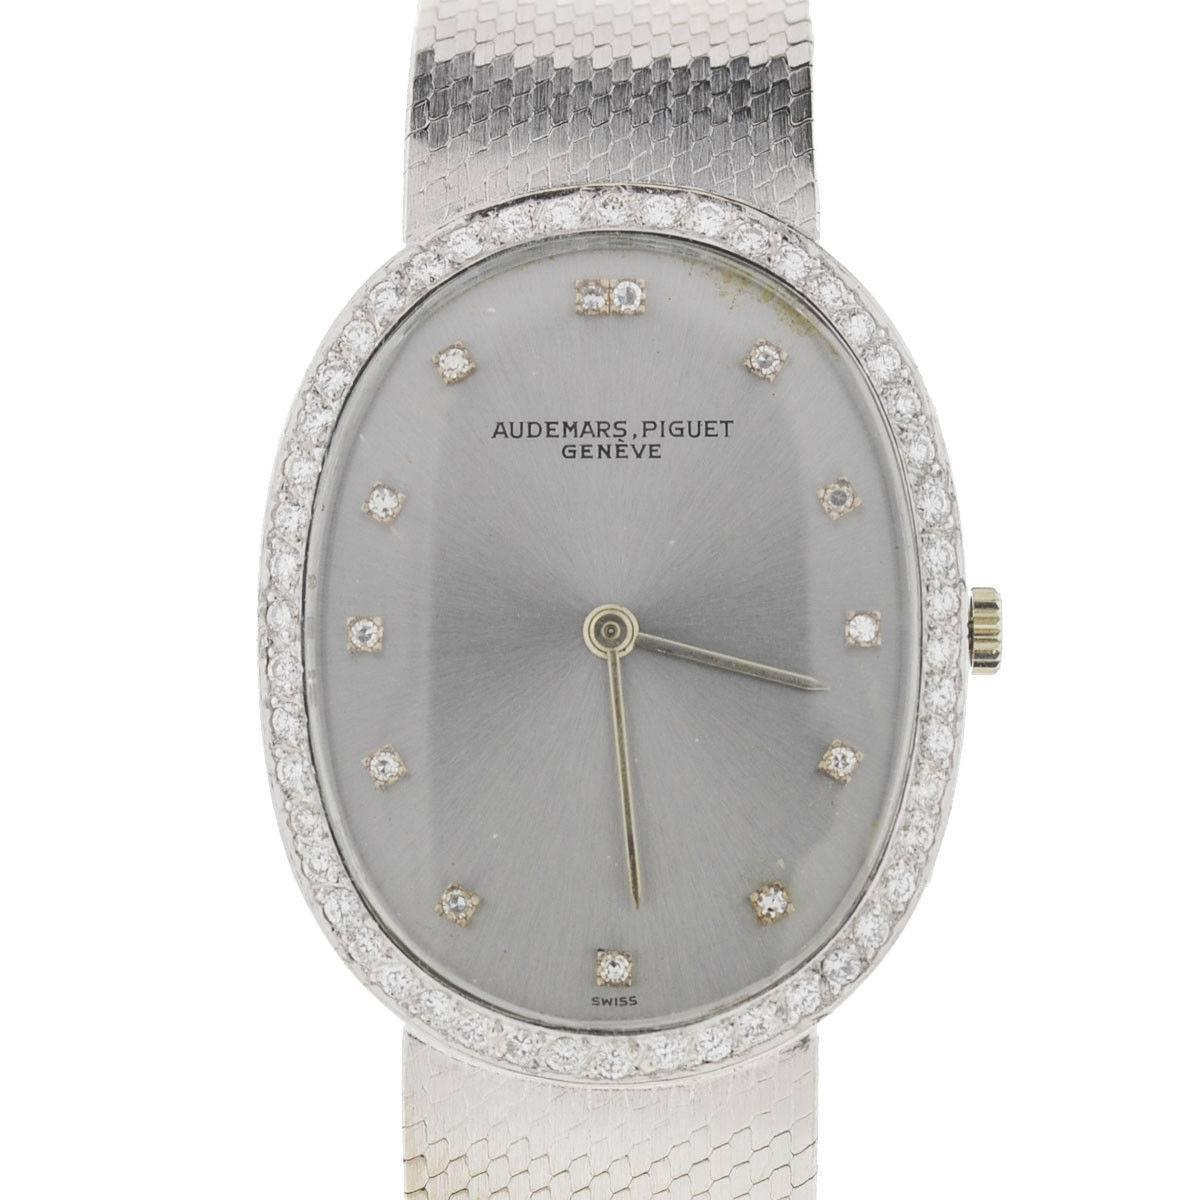 Audemars Piguet White Gold Diamond Vintage Manual Wristwatch